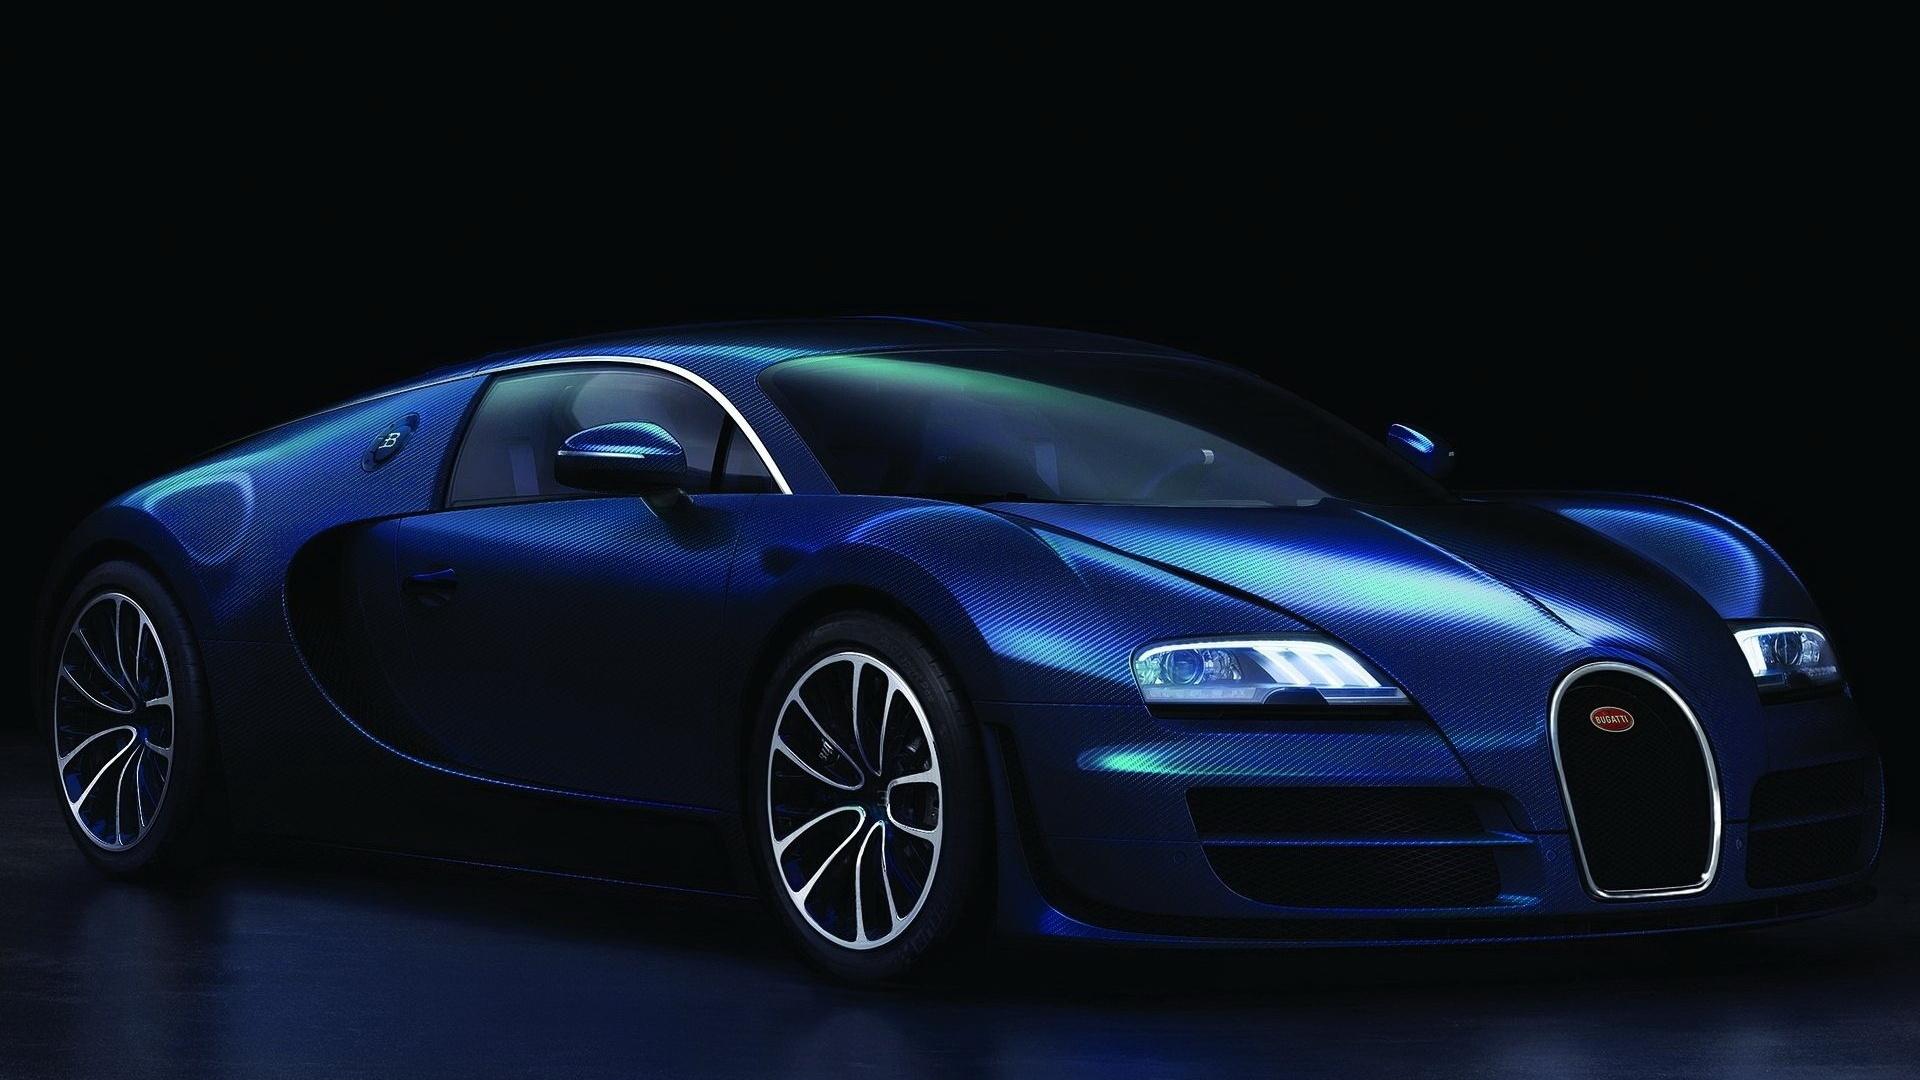 Bugatti Veyron Super Sport Wallpaper Wallpapersafari 2013 Engine Diagram 50 Hd For Laptop 1920x1080